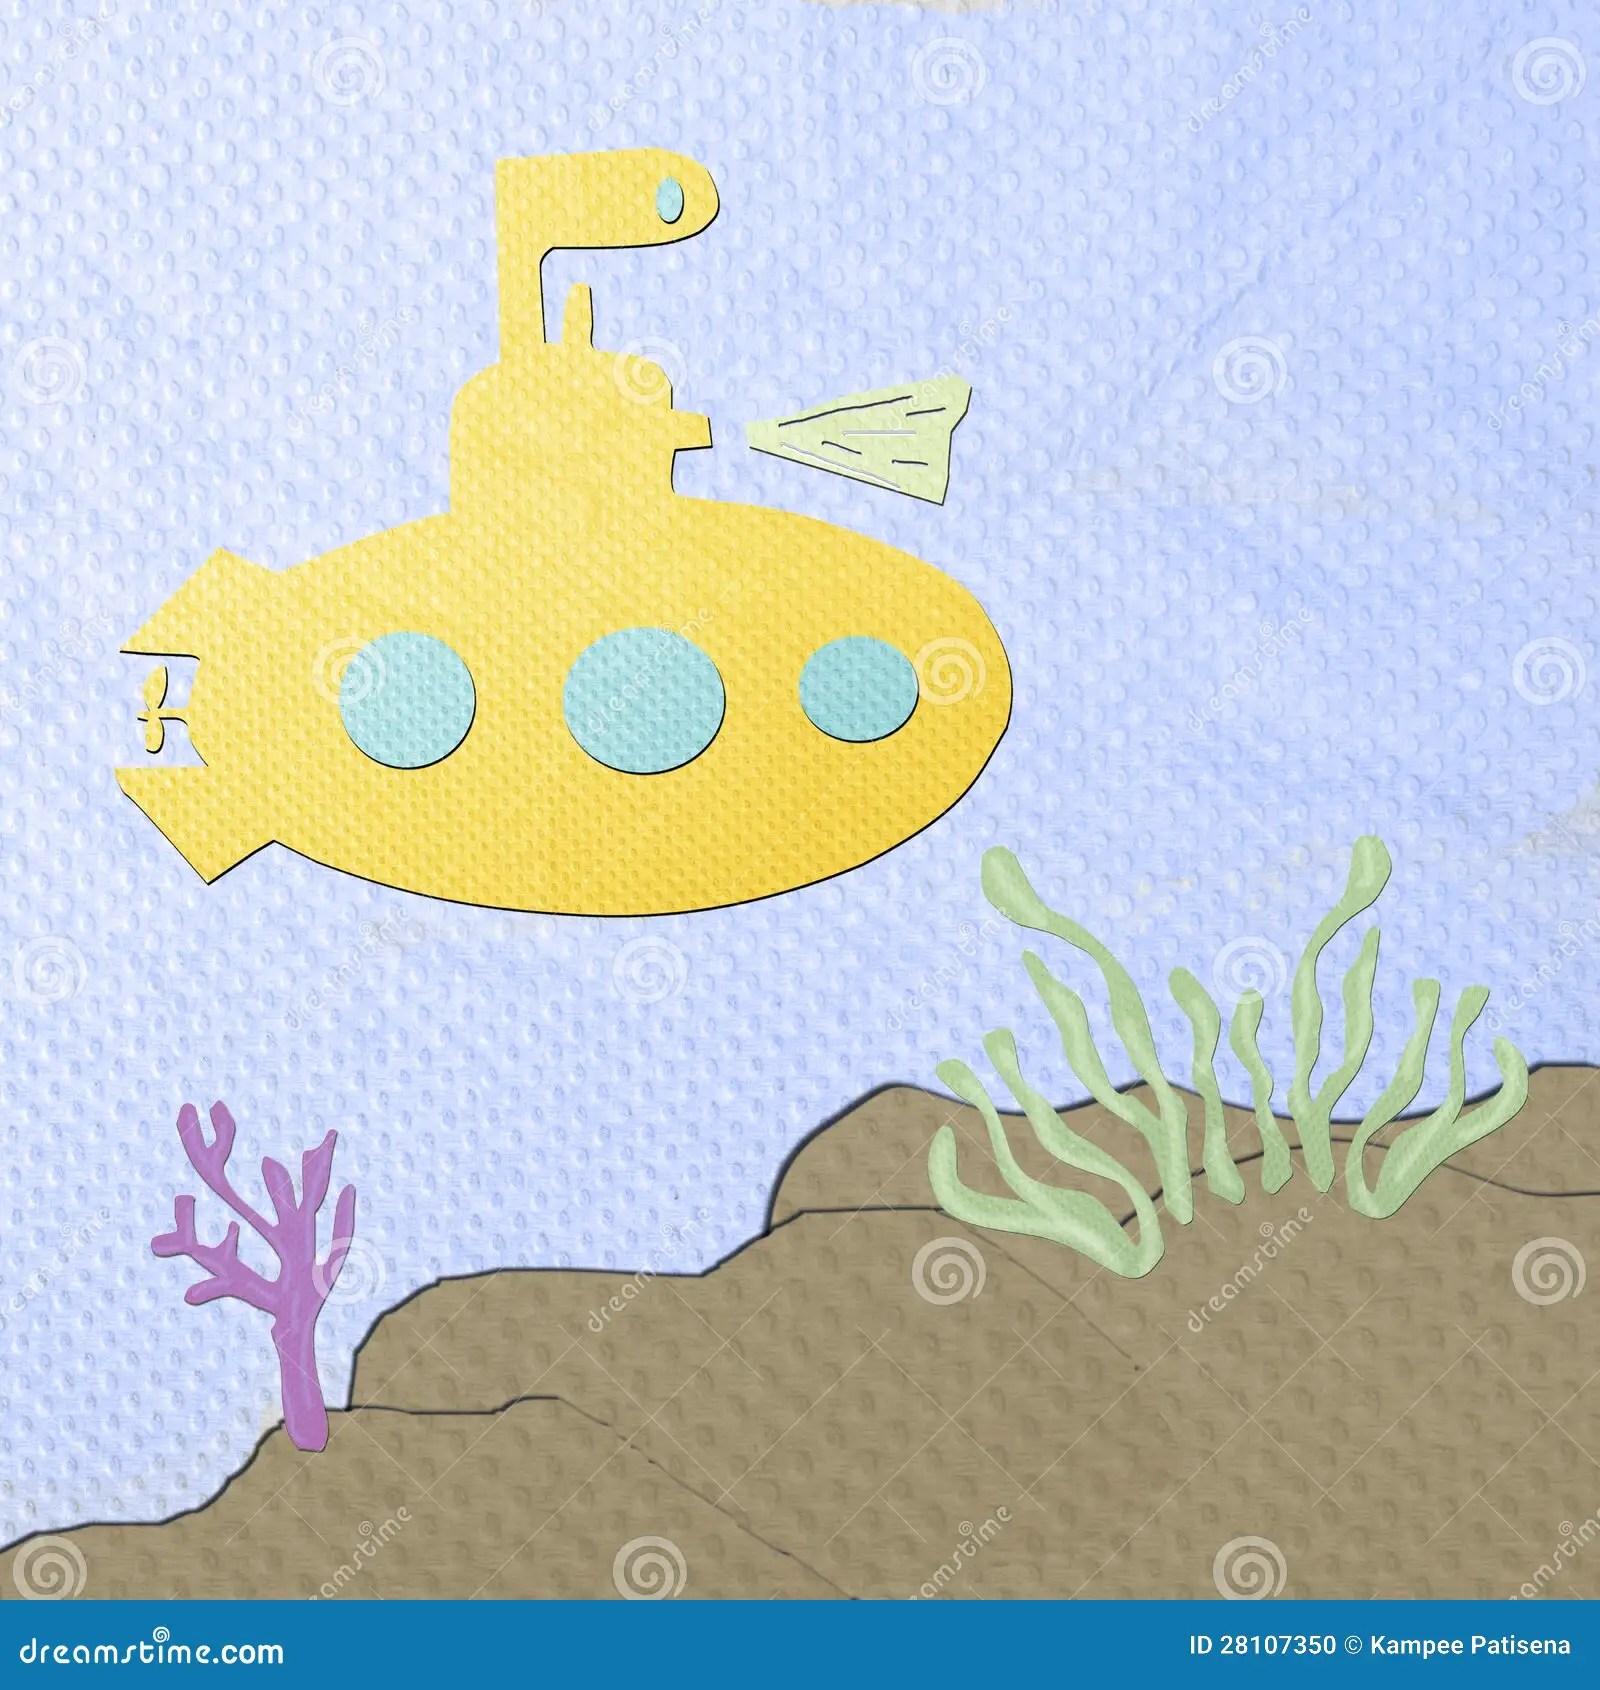 Submarine Cartoon Made From Tissue Papercraft Stock Photo